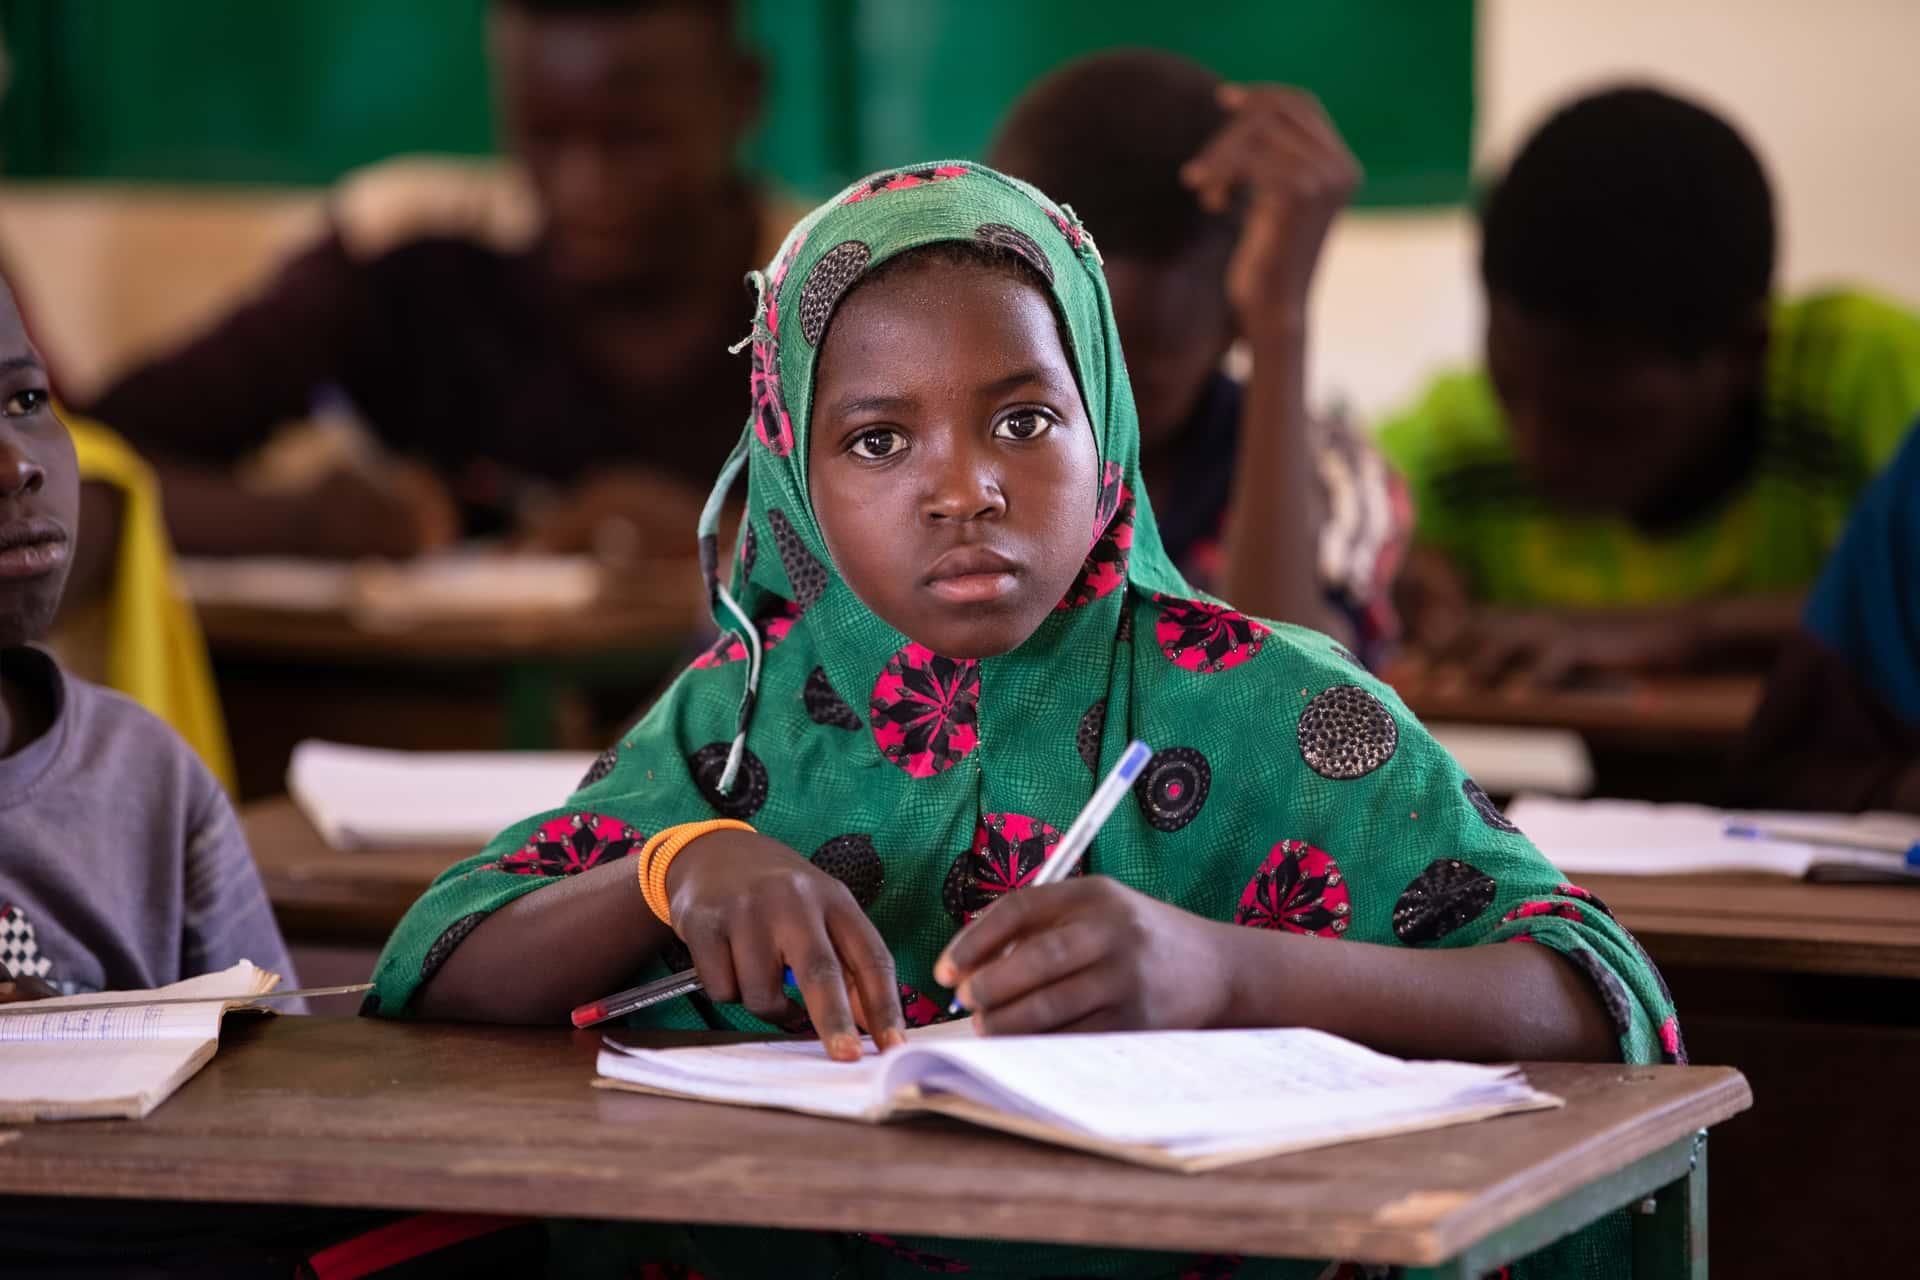 Alle barn, i alle land, på skolen! Skriv under på www.adra.org/inschool